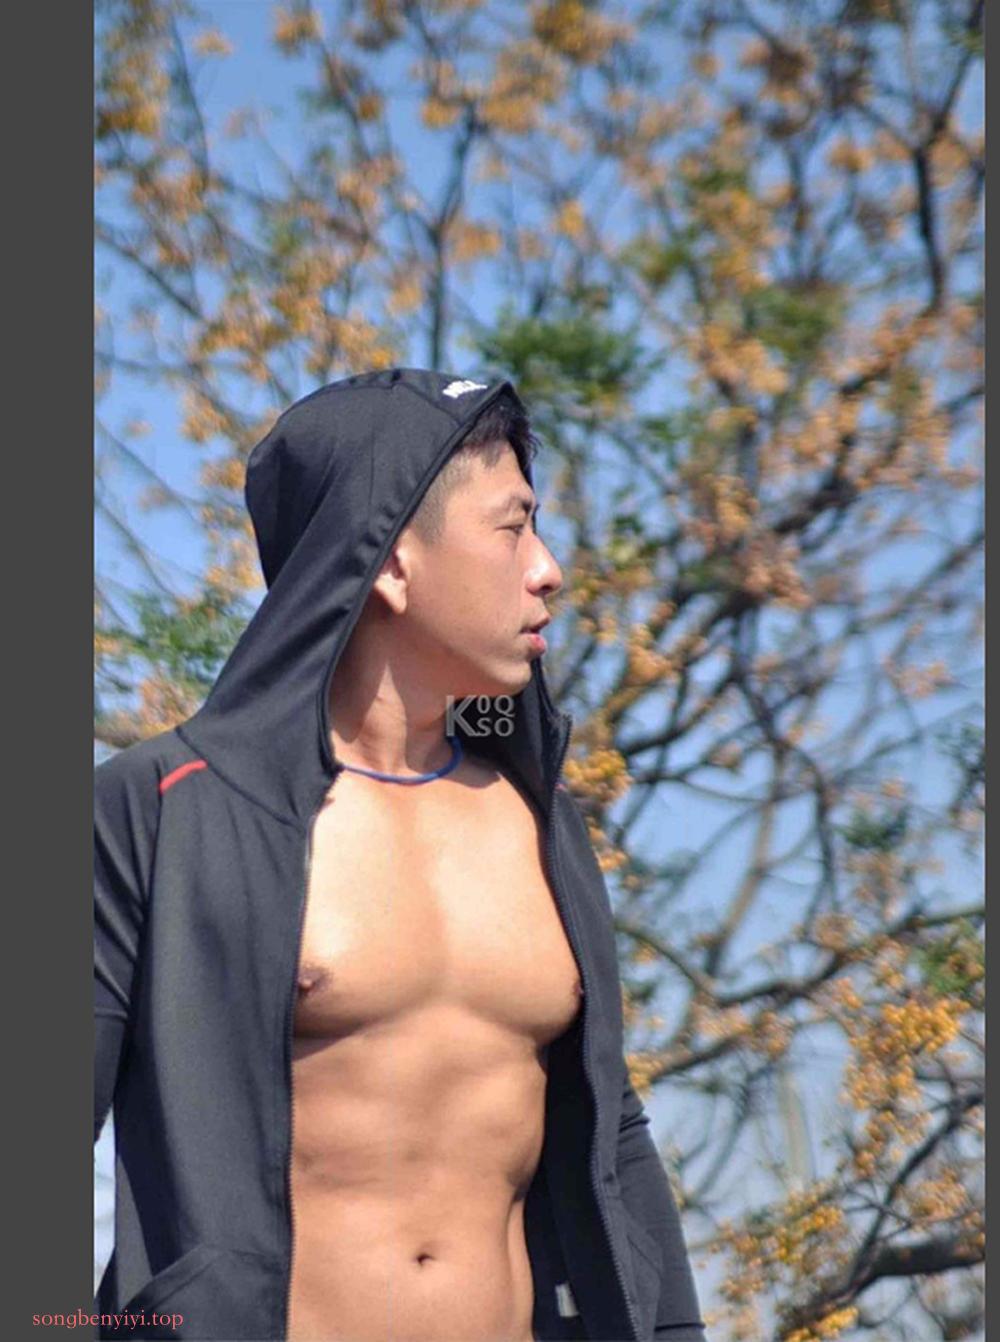 BE A MODEL 12 暖男 NICK的暖暖笑容 會融化你的心((全見版))-11.png